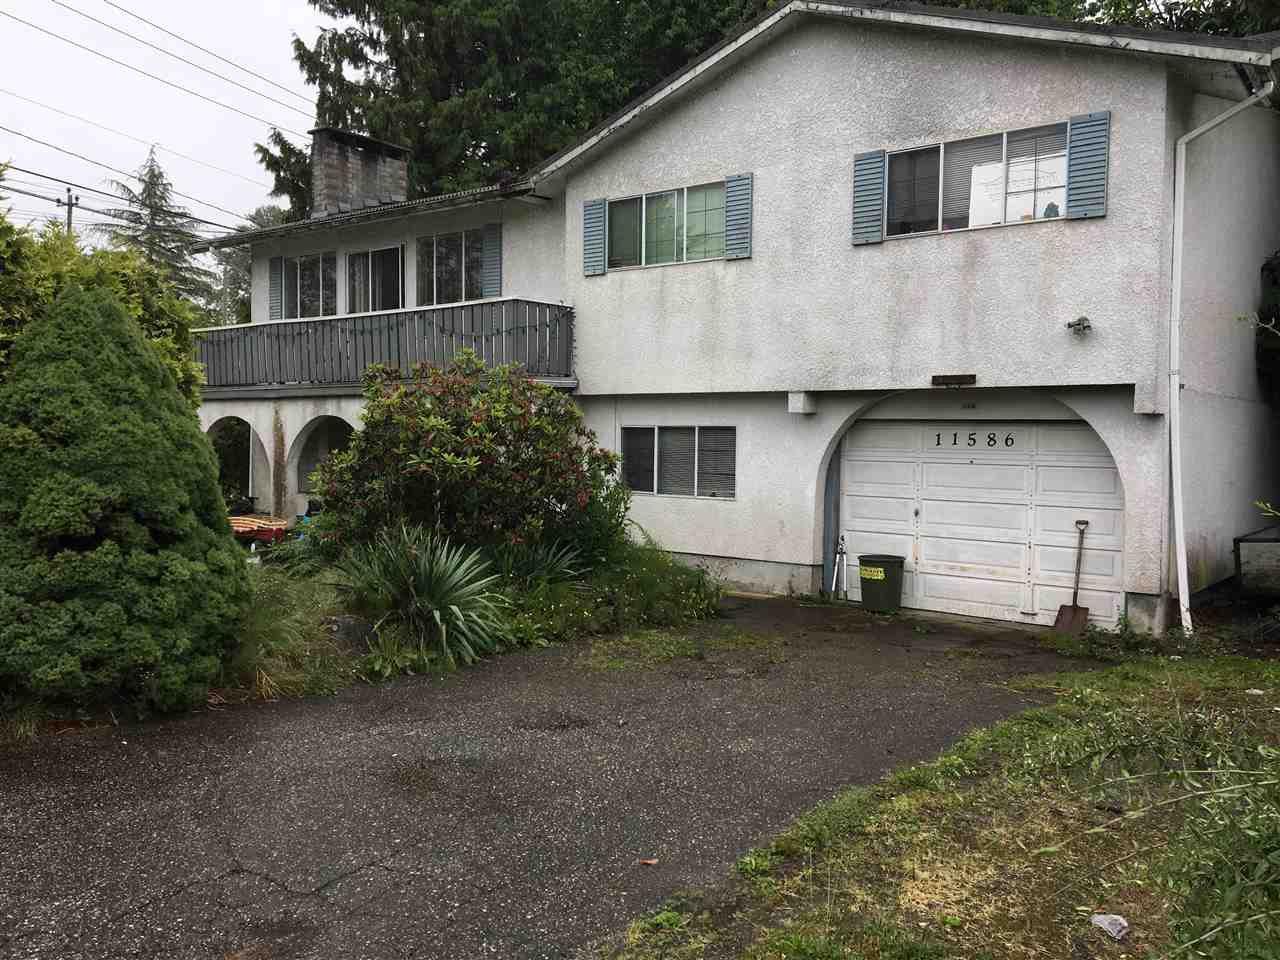 Main Photo: 11586 84B Avenue in Delta: Annieville House for sale (N. Delta)  : MLS®# R2279098